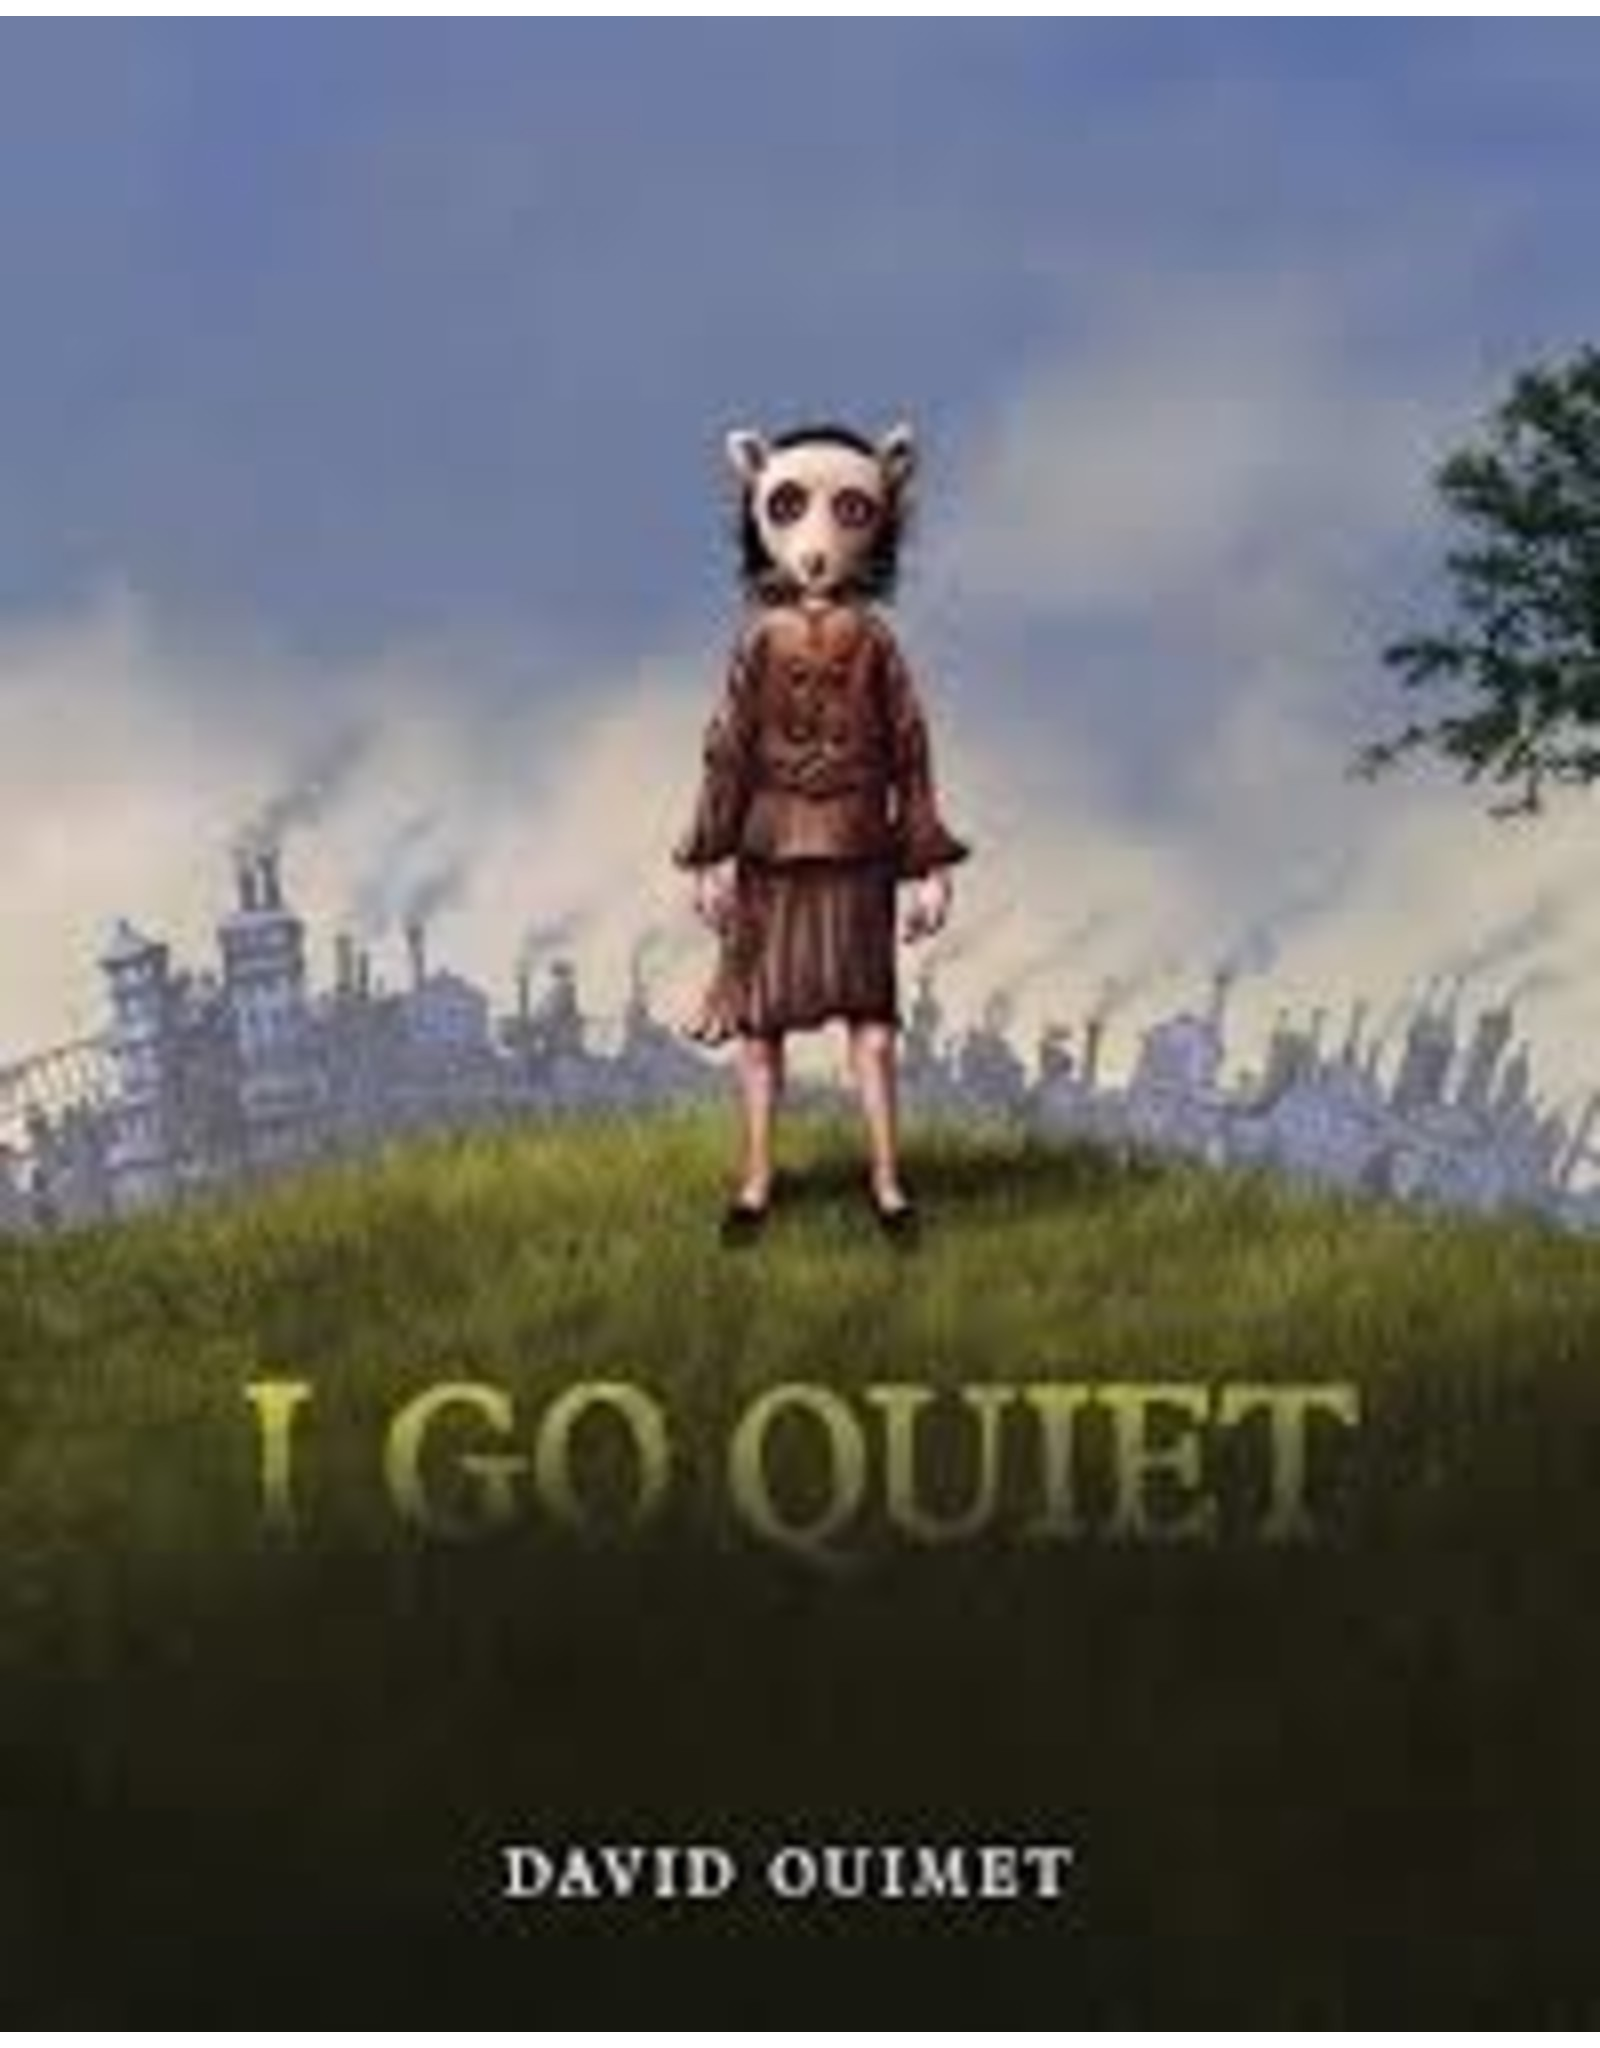 Books I Go Quiet by David Ouimet